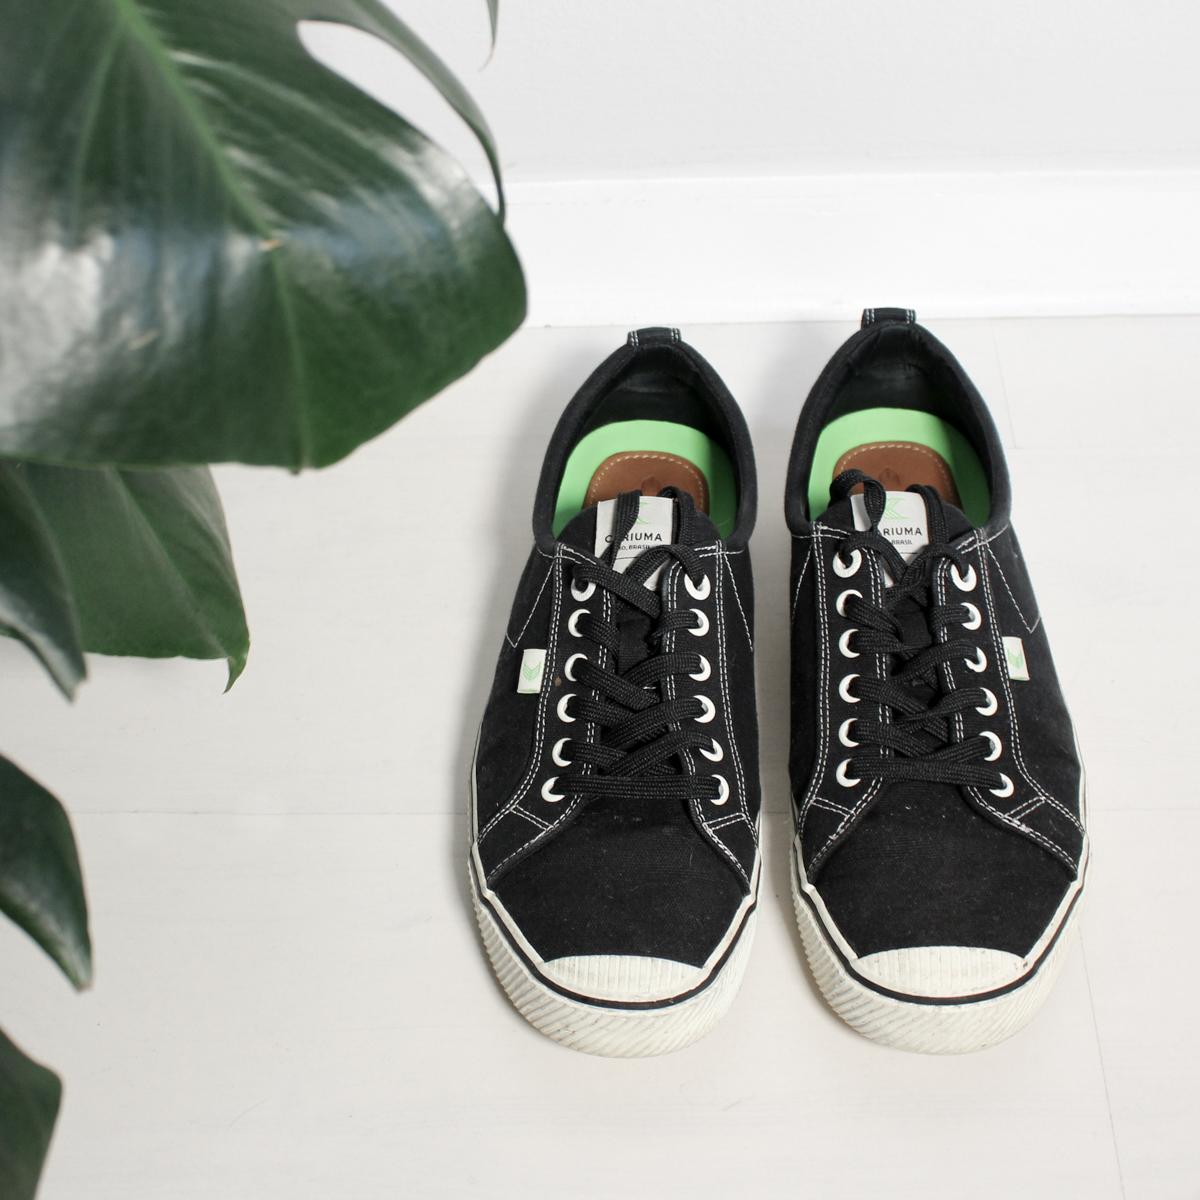 Close-up of Cariuma Sneakers